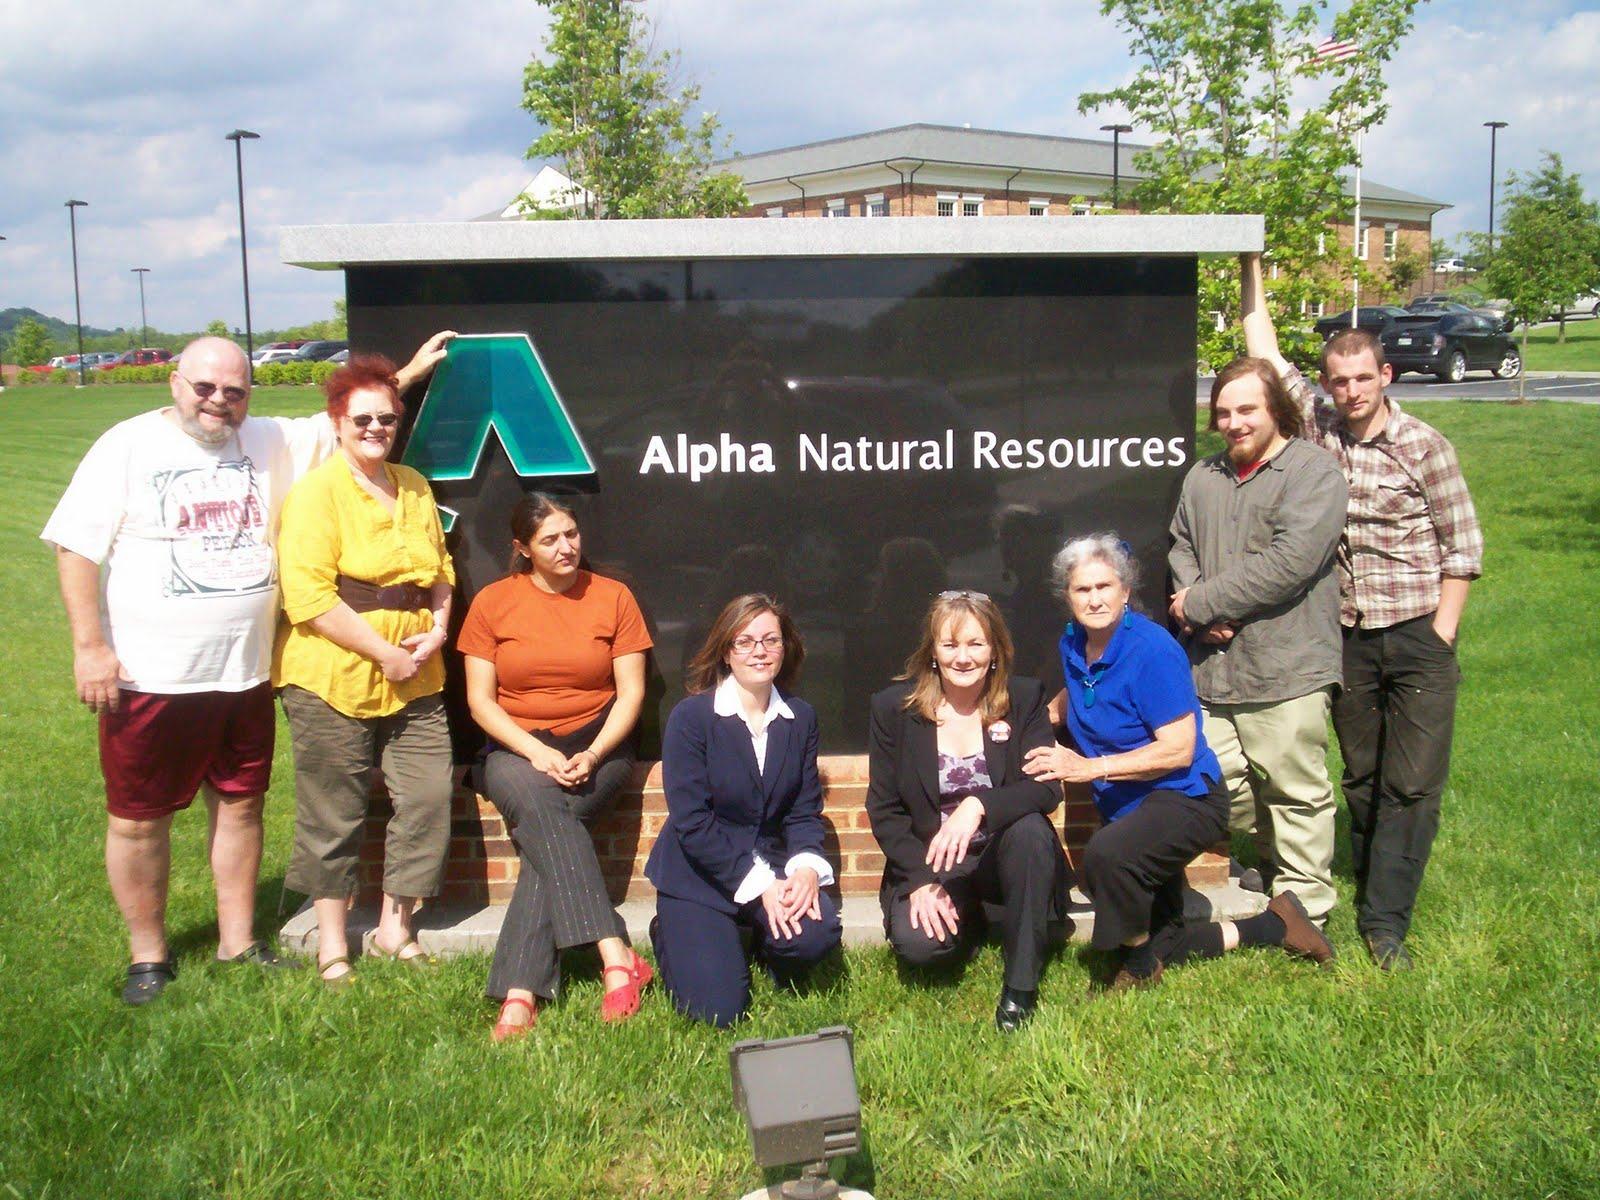 Alpha Natural Resources Pax Wv